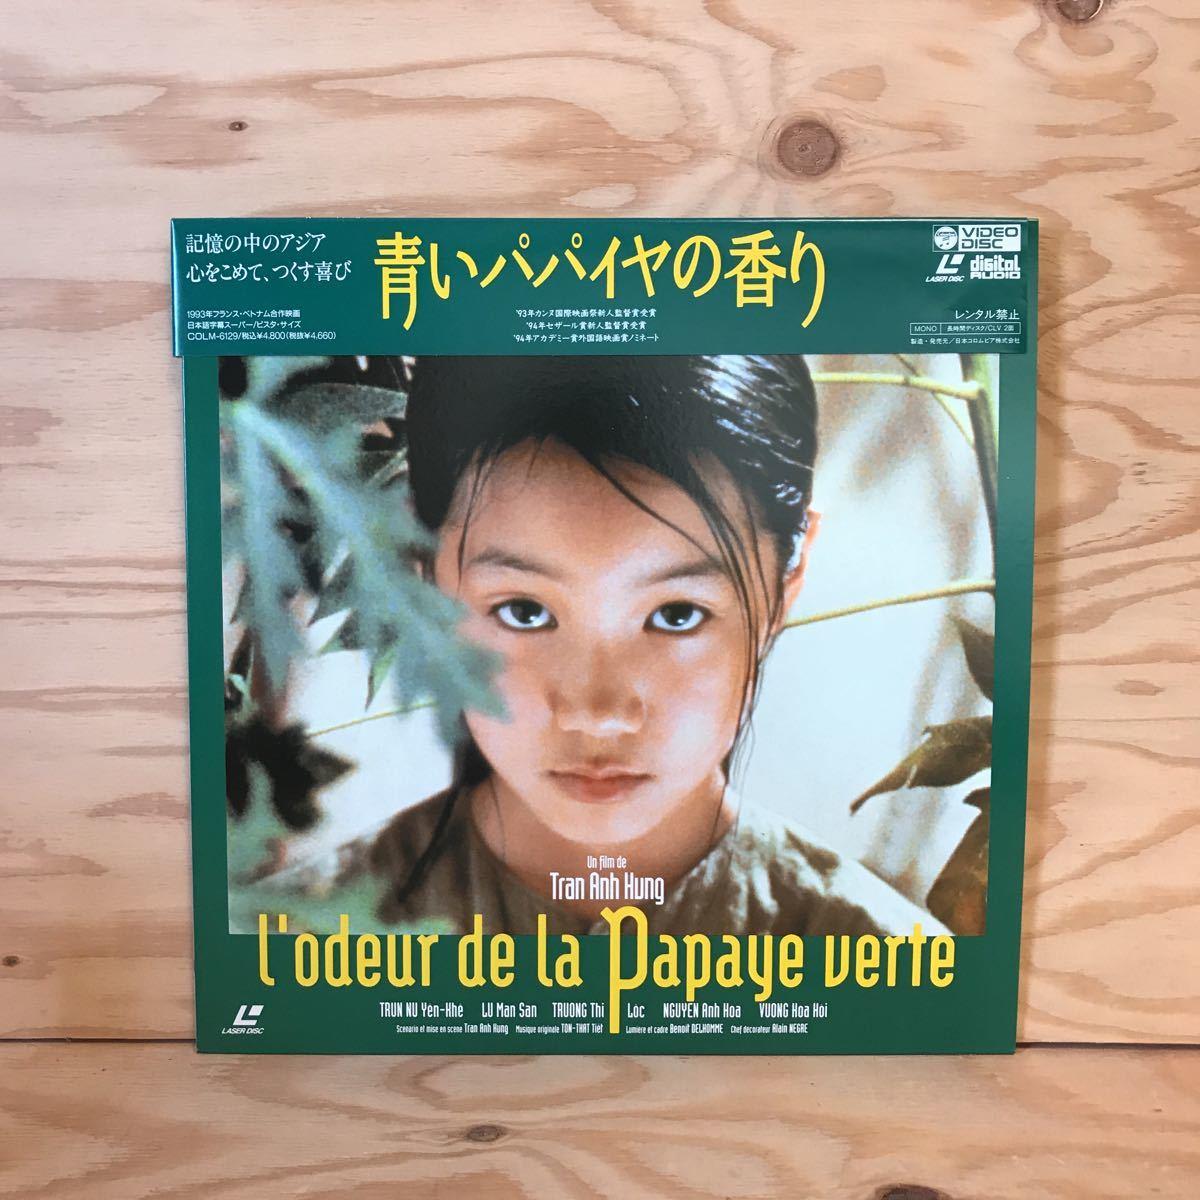 ◎K3FJJD-200218 レア[青いパパイヤの香り L'odeur de la Papaye verte]LD レーザー トラン・アン・ユン トラン・ヌー・イェン・ケー_画像1